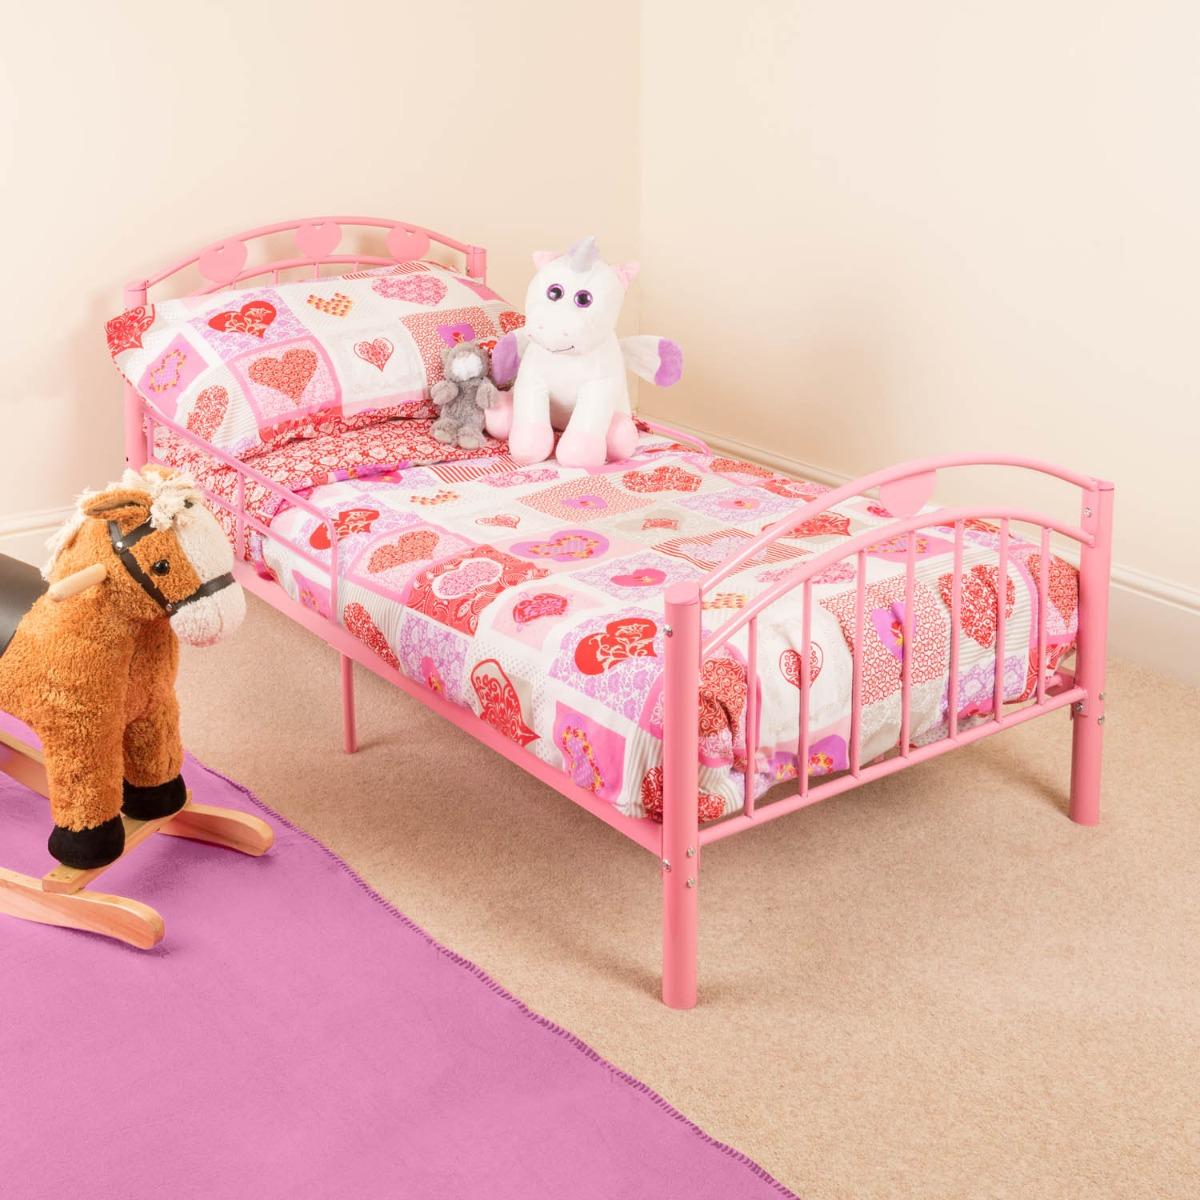 Image of Pink Metal Toddler Bed Frame